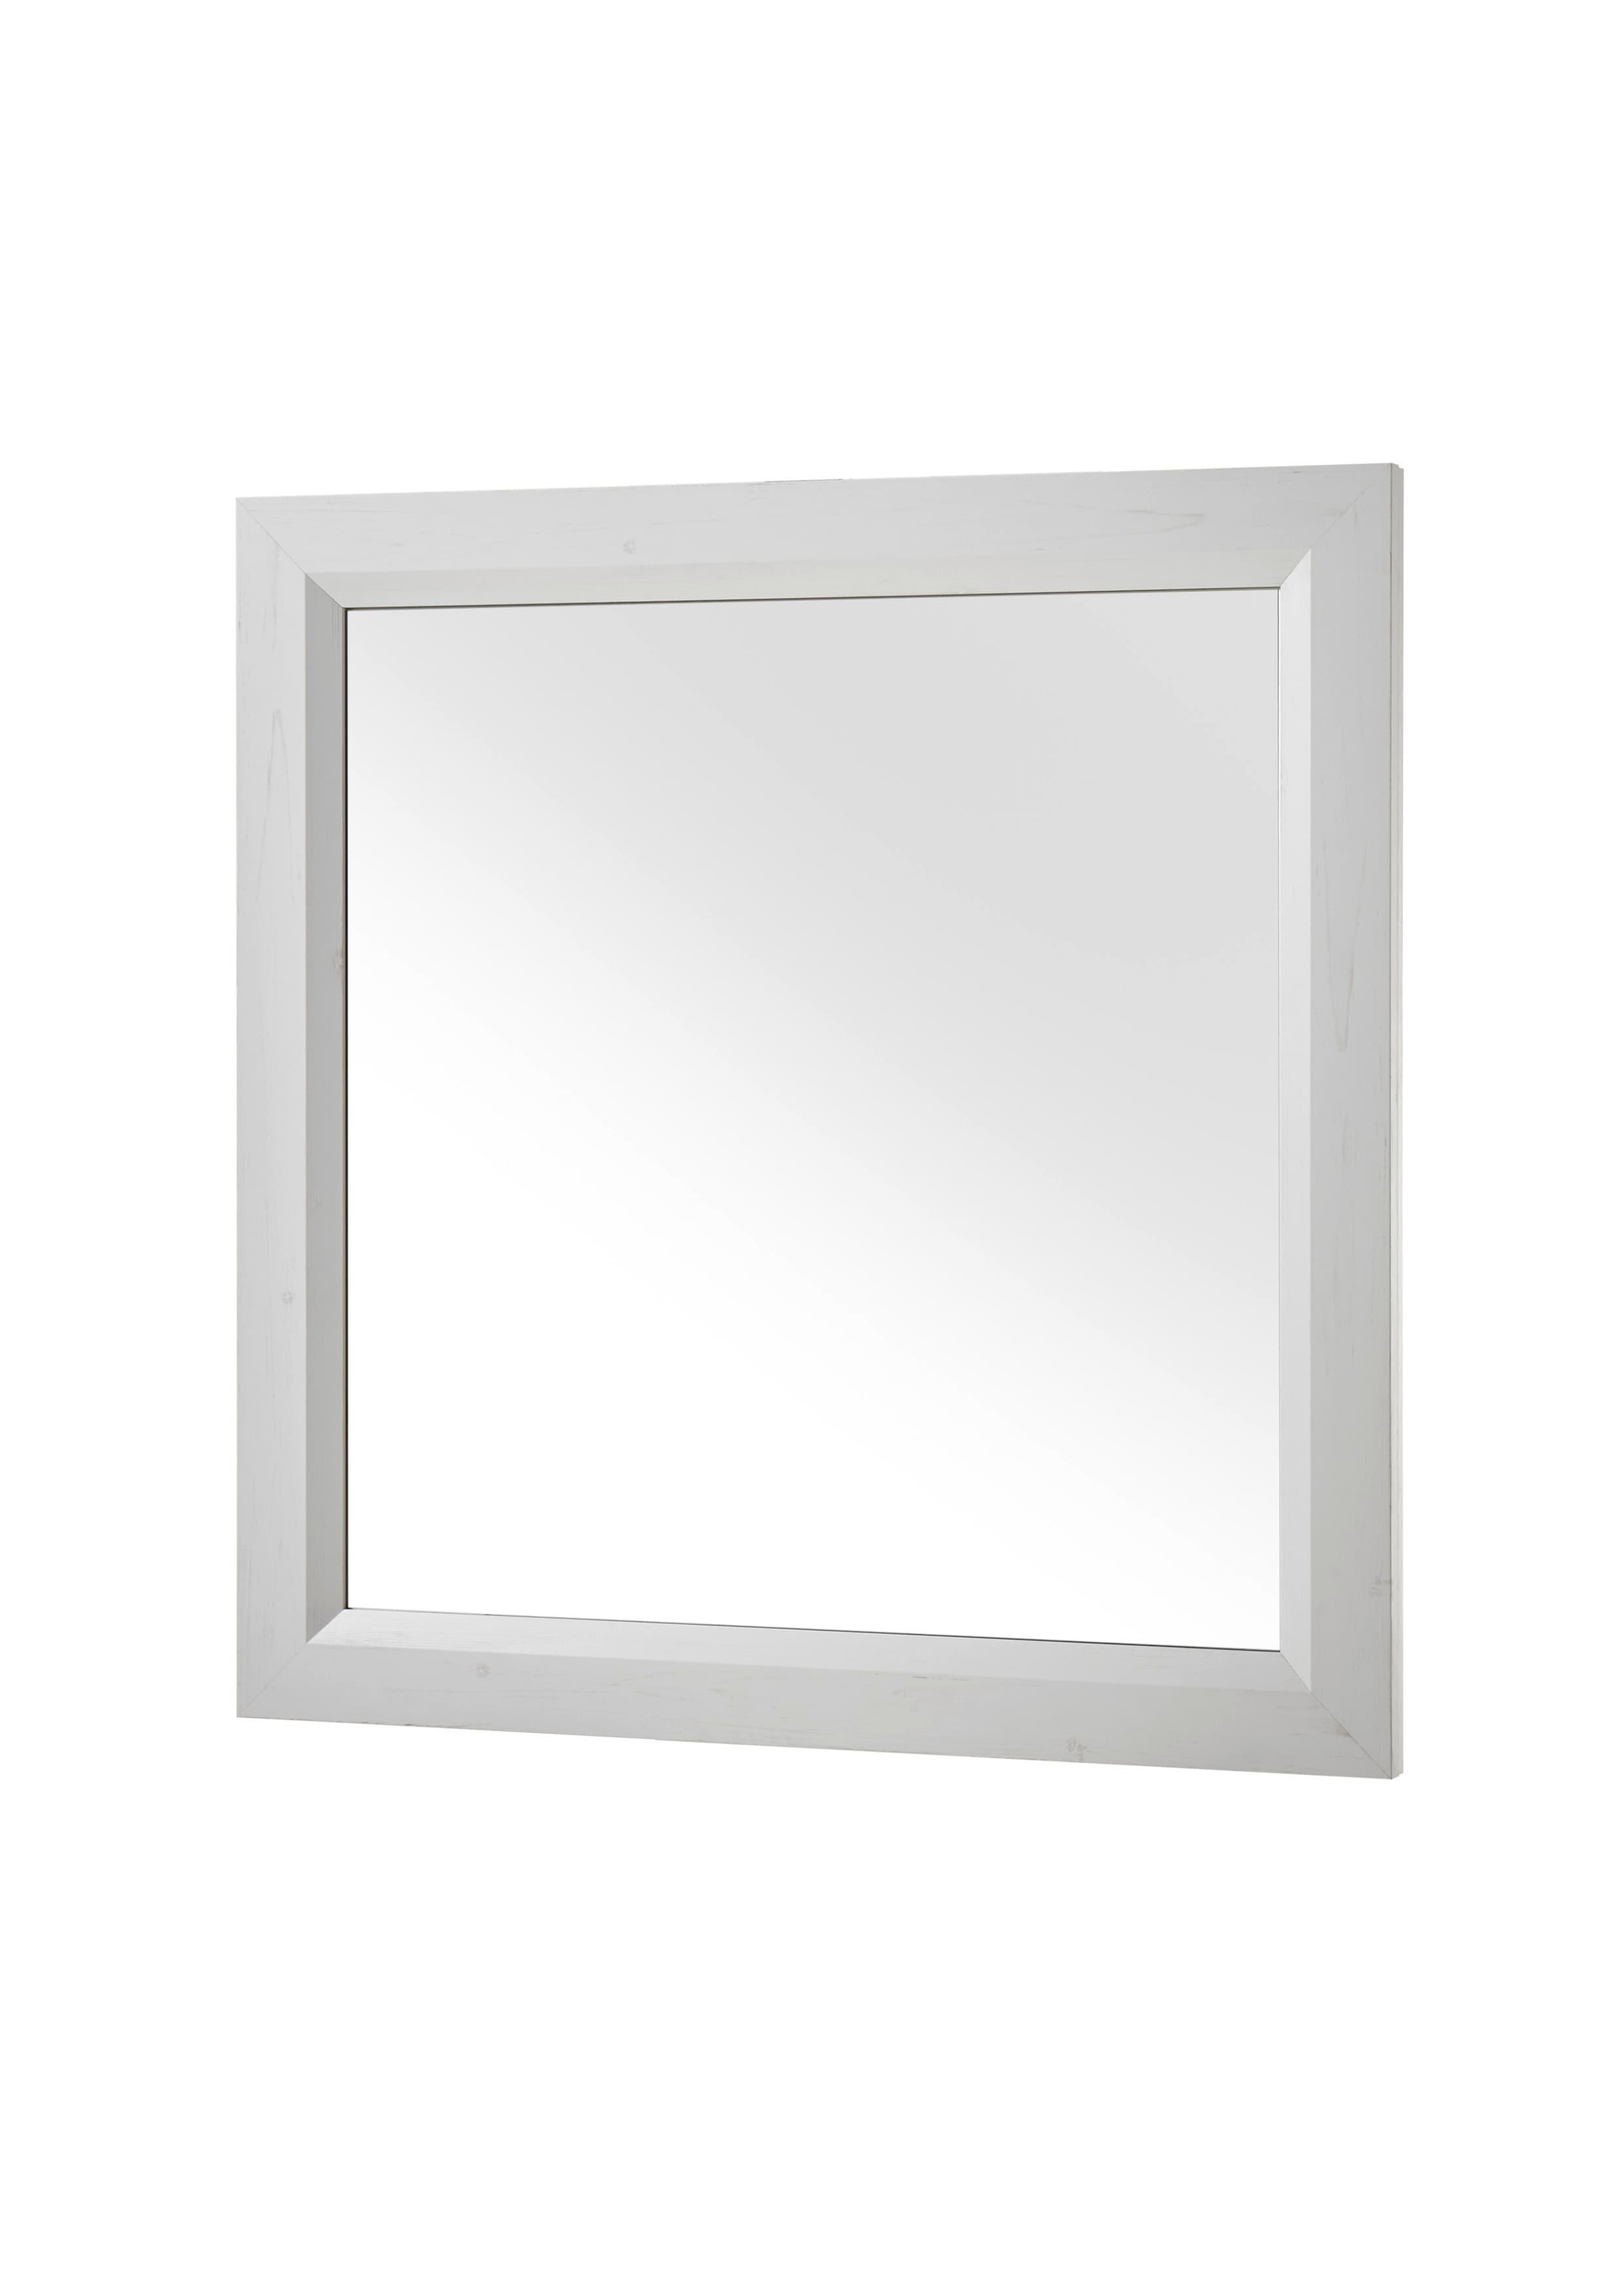 Oglinda decorativa cu rama din pal Ava Alb, L91xl93 cm